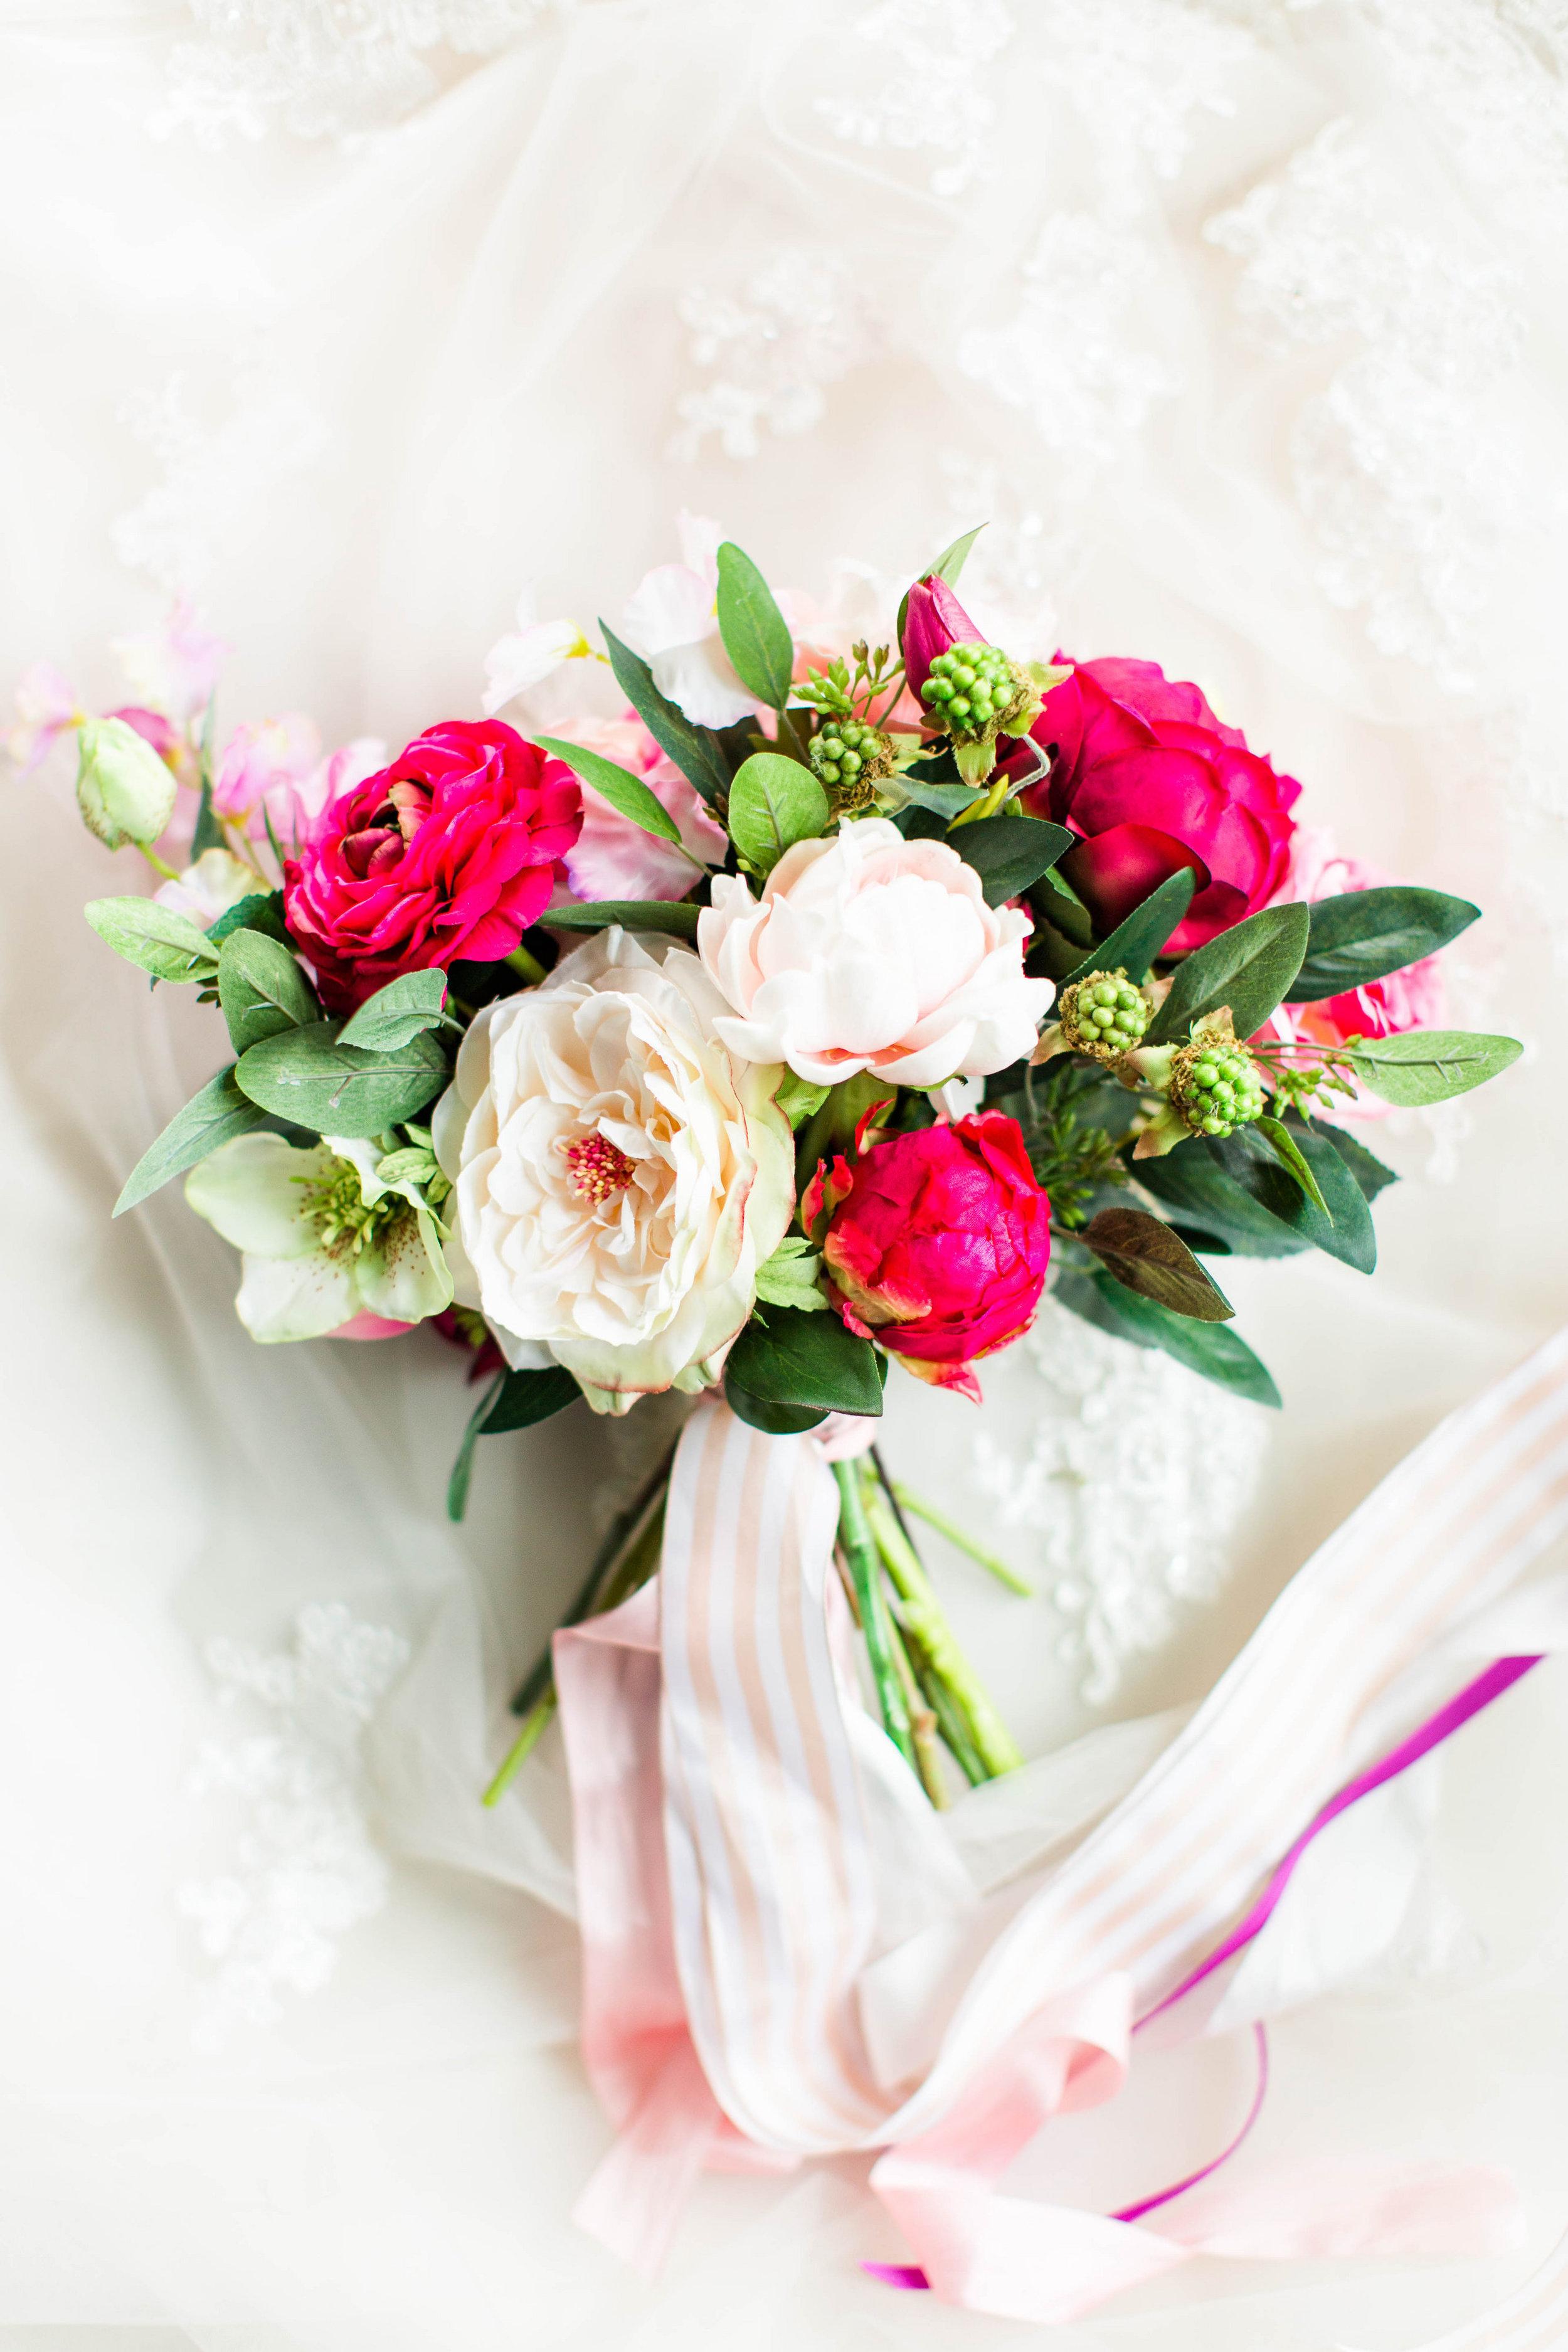 afloral-fake-flower-wedding-ivory-and-beau-bridal-boutique-maggie-sottero-saffron-the-hall-on-vine-wedding-statesboro-wedding-savannah-wedding-kristian-designs-rachel-strickland-photography-savannah-bridal-southern-bride-savannah-bride-29.jpg